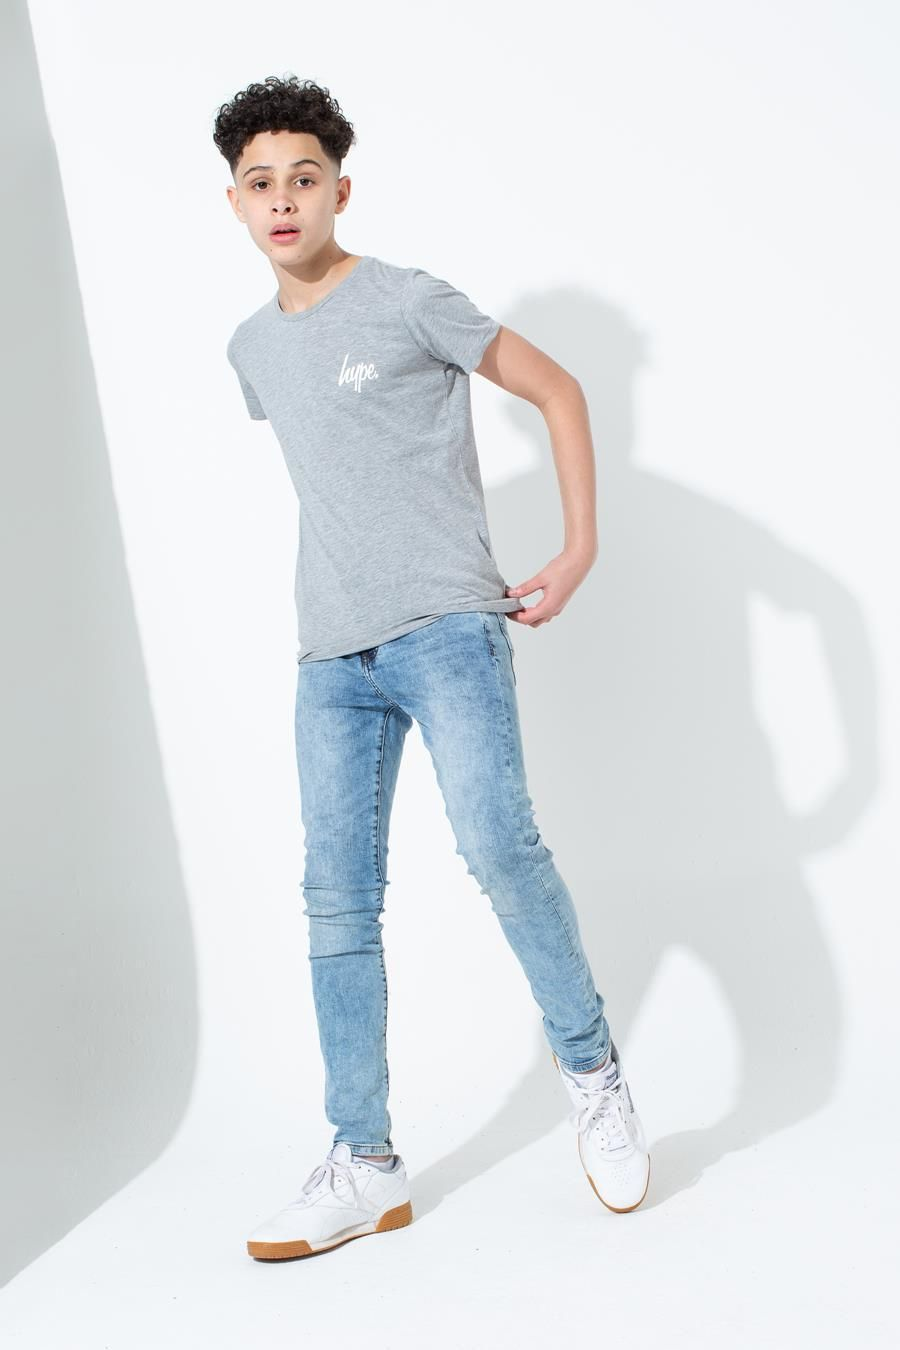 Hype Grey Mini Script Kids T-Shirt